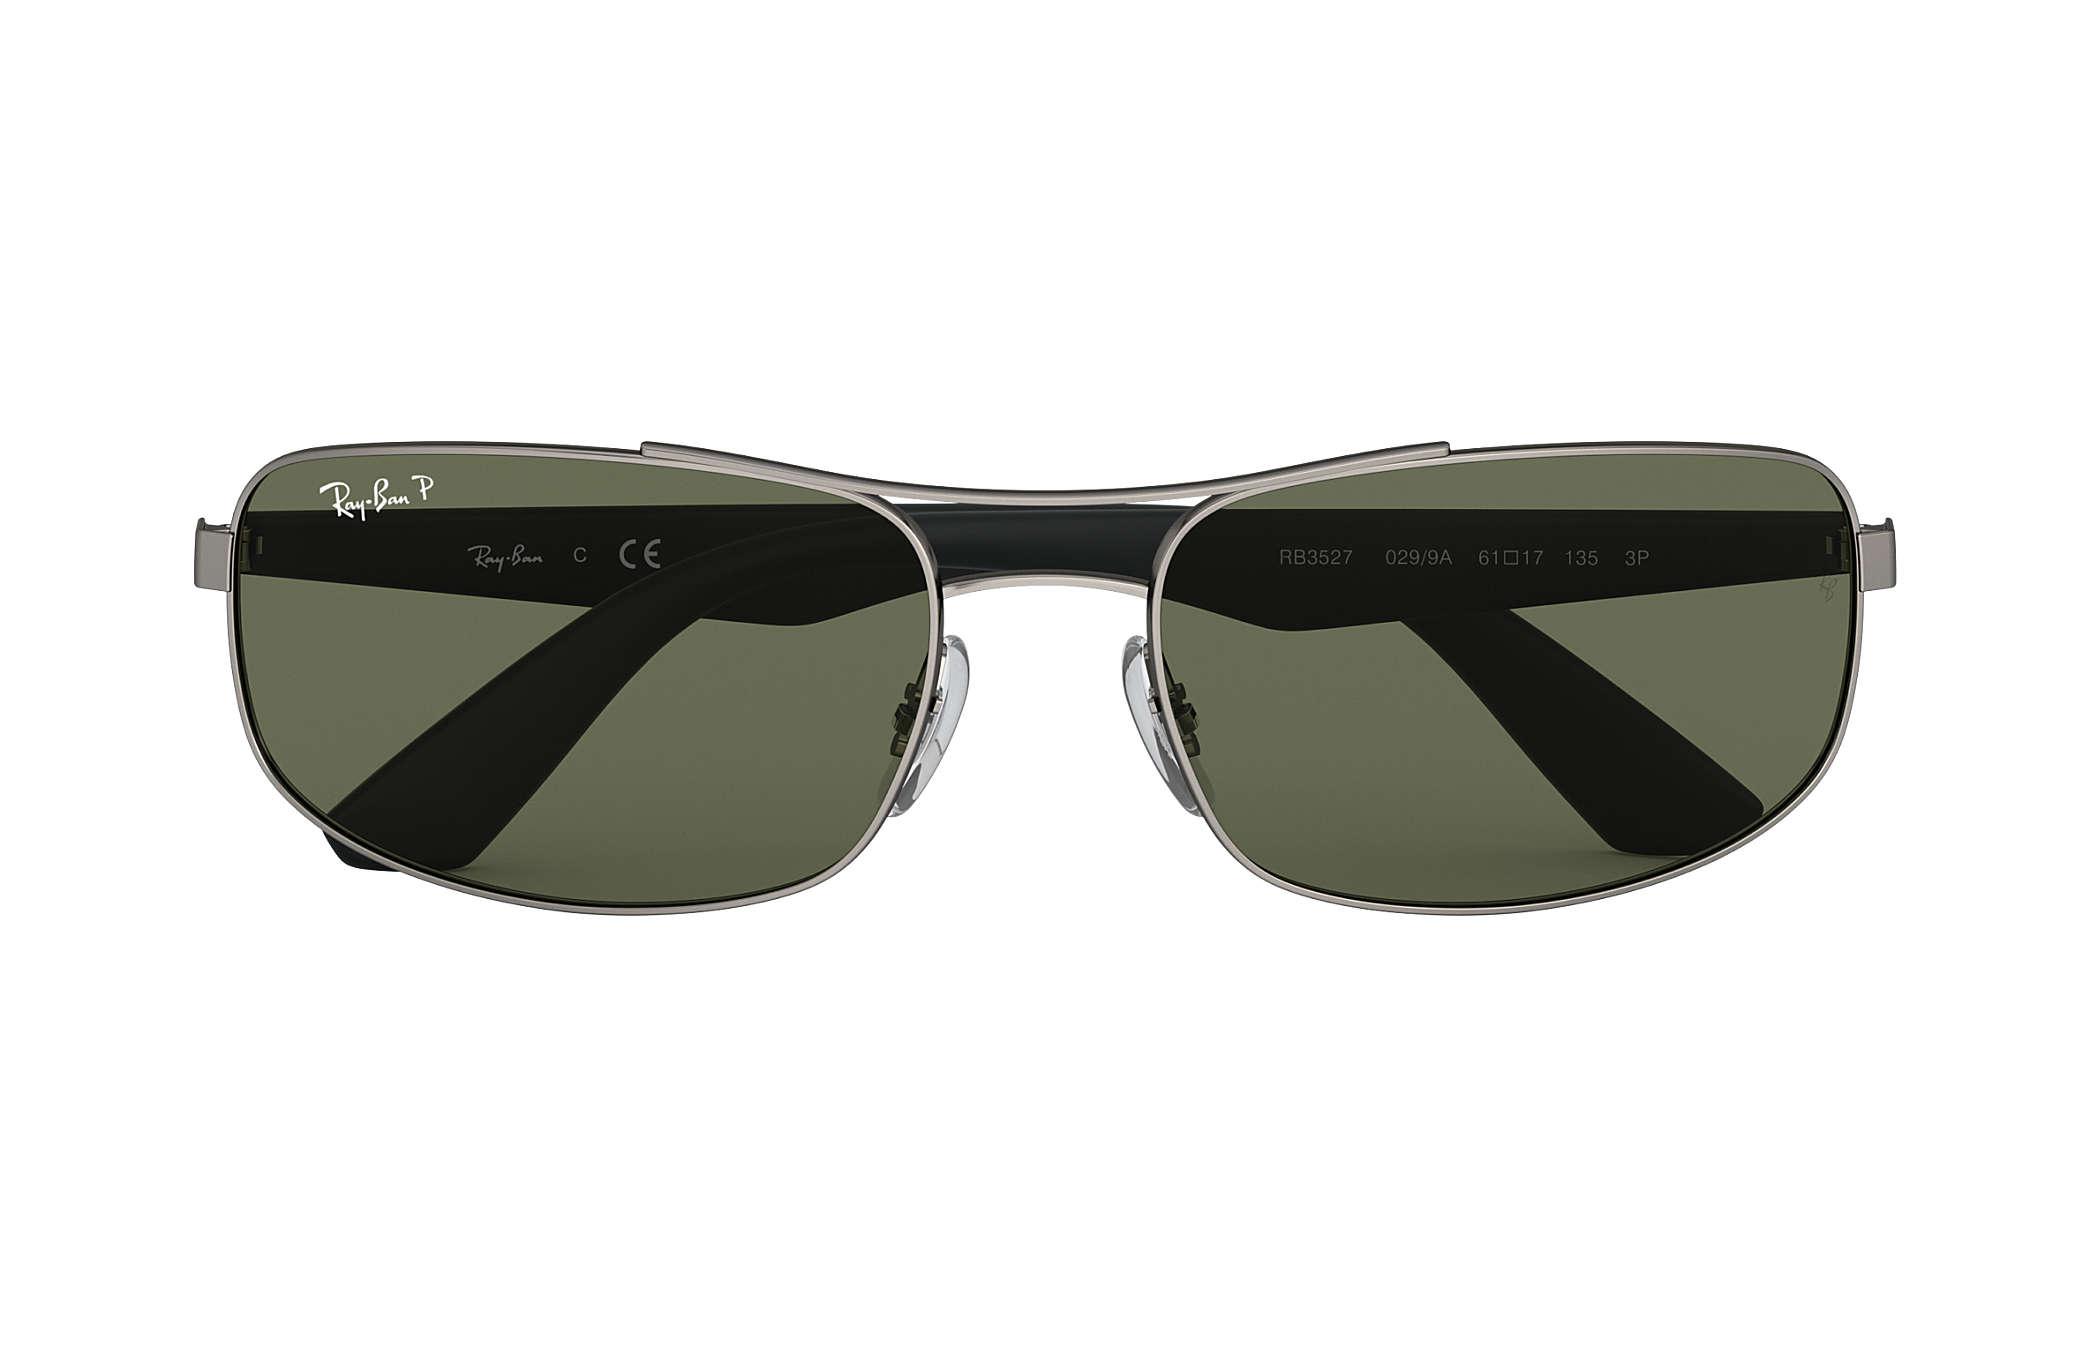 0b46abc158f7e Ray-Ban RB3527 Gunmetal - Metal - Green Polarized Lenses ...